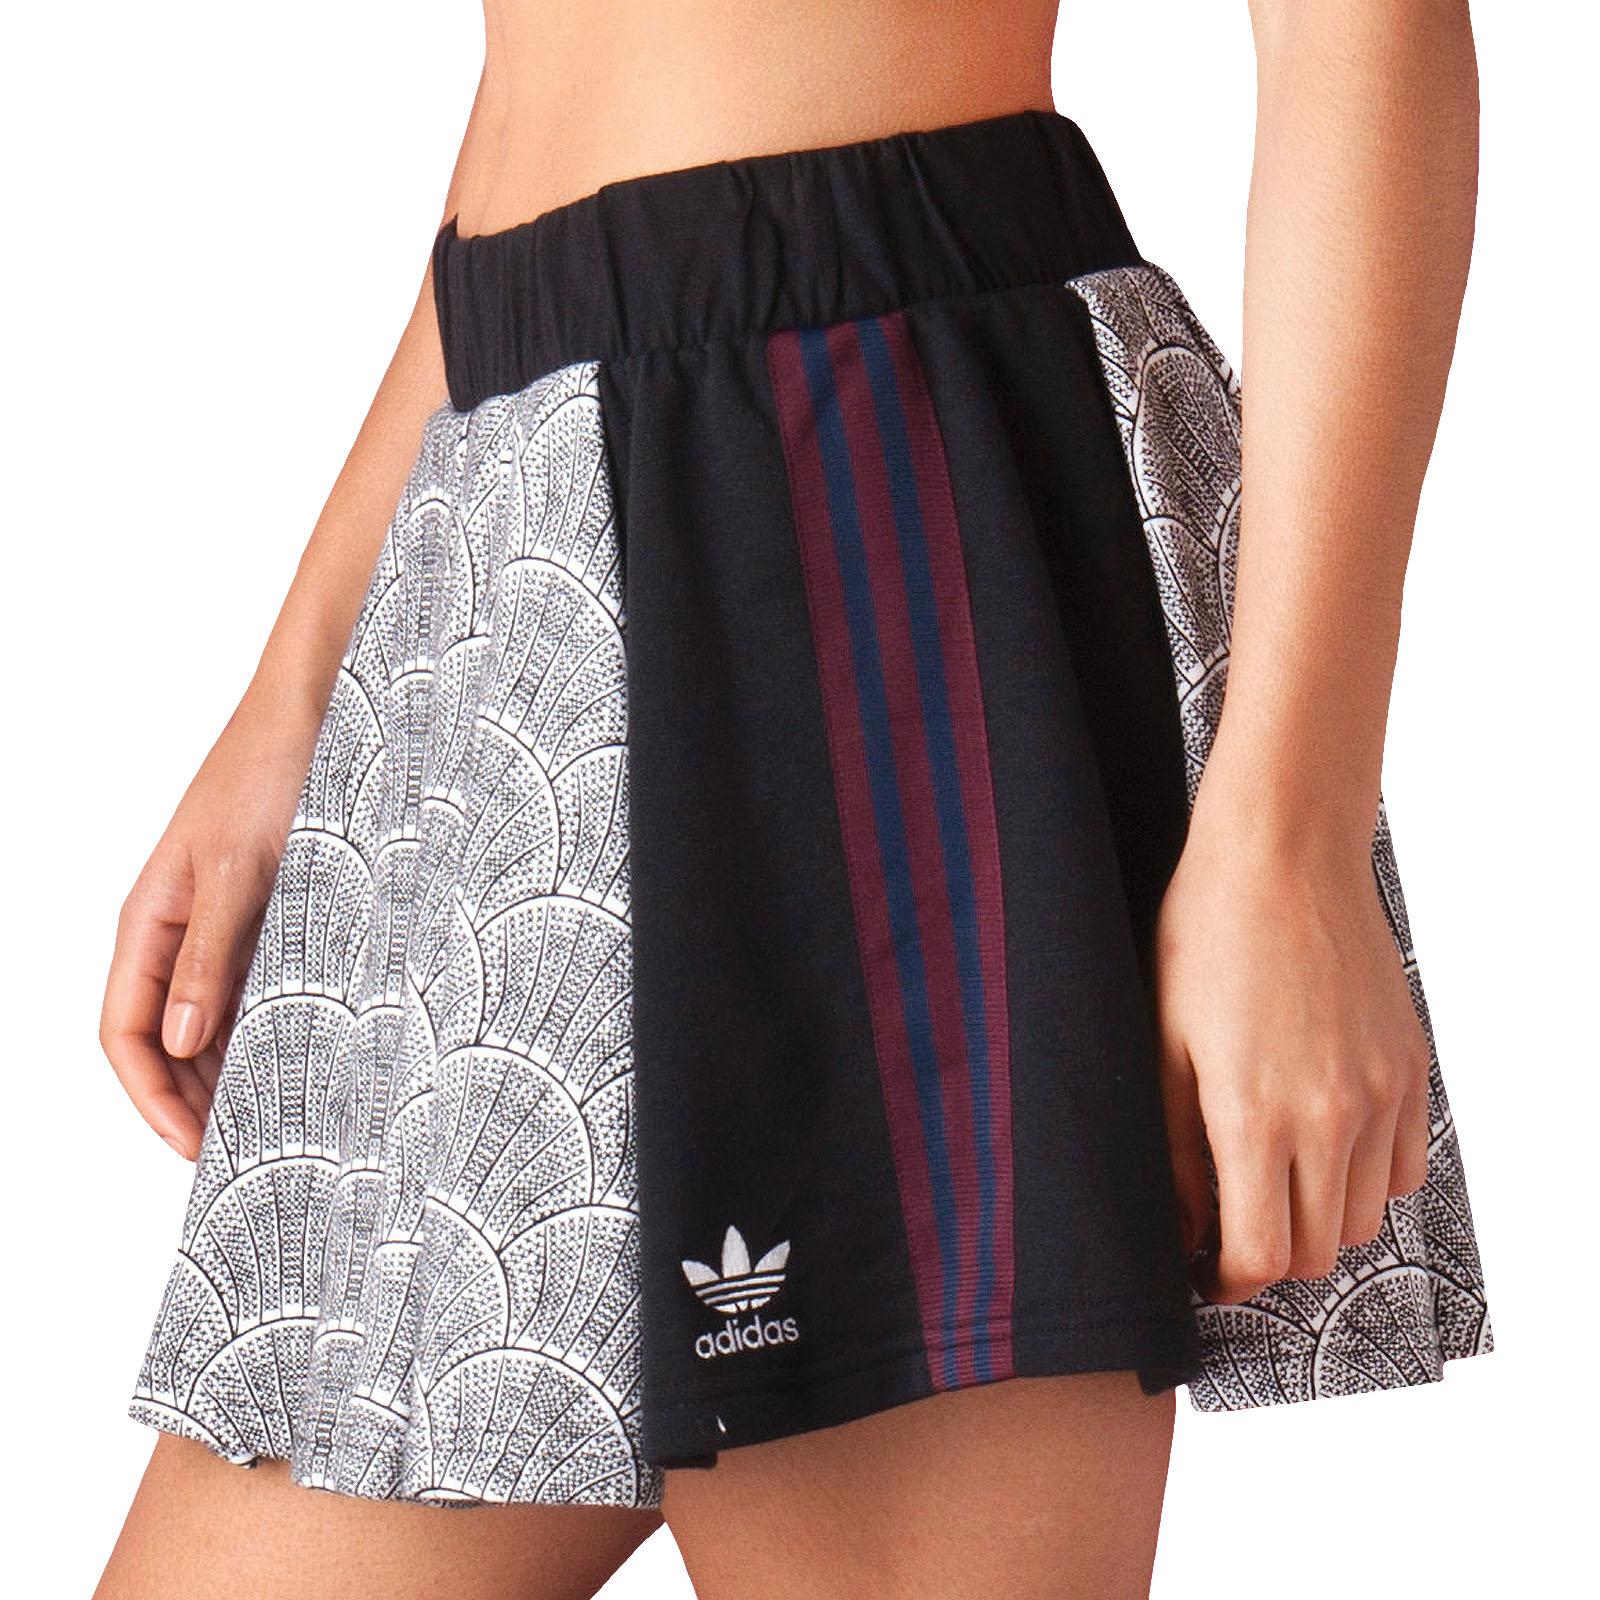 cb54acc68d Details about adidas Originals Womens Trefoil Logo Shell Tile Pleated  Fashion Skirt (B Grade)